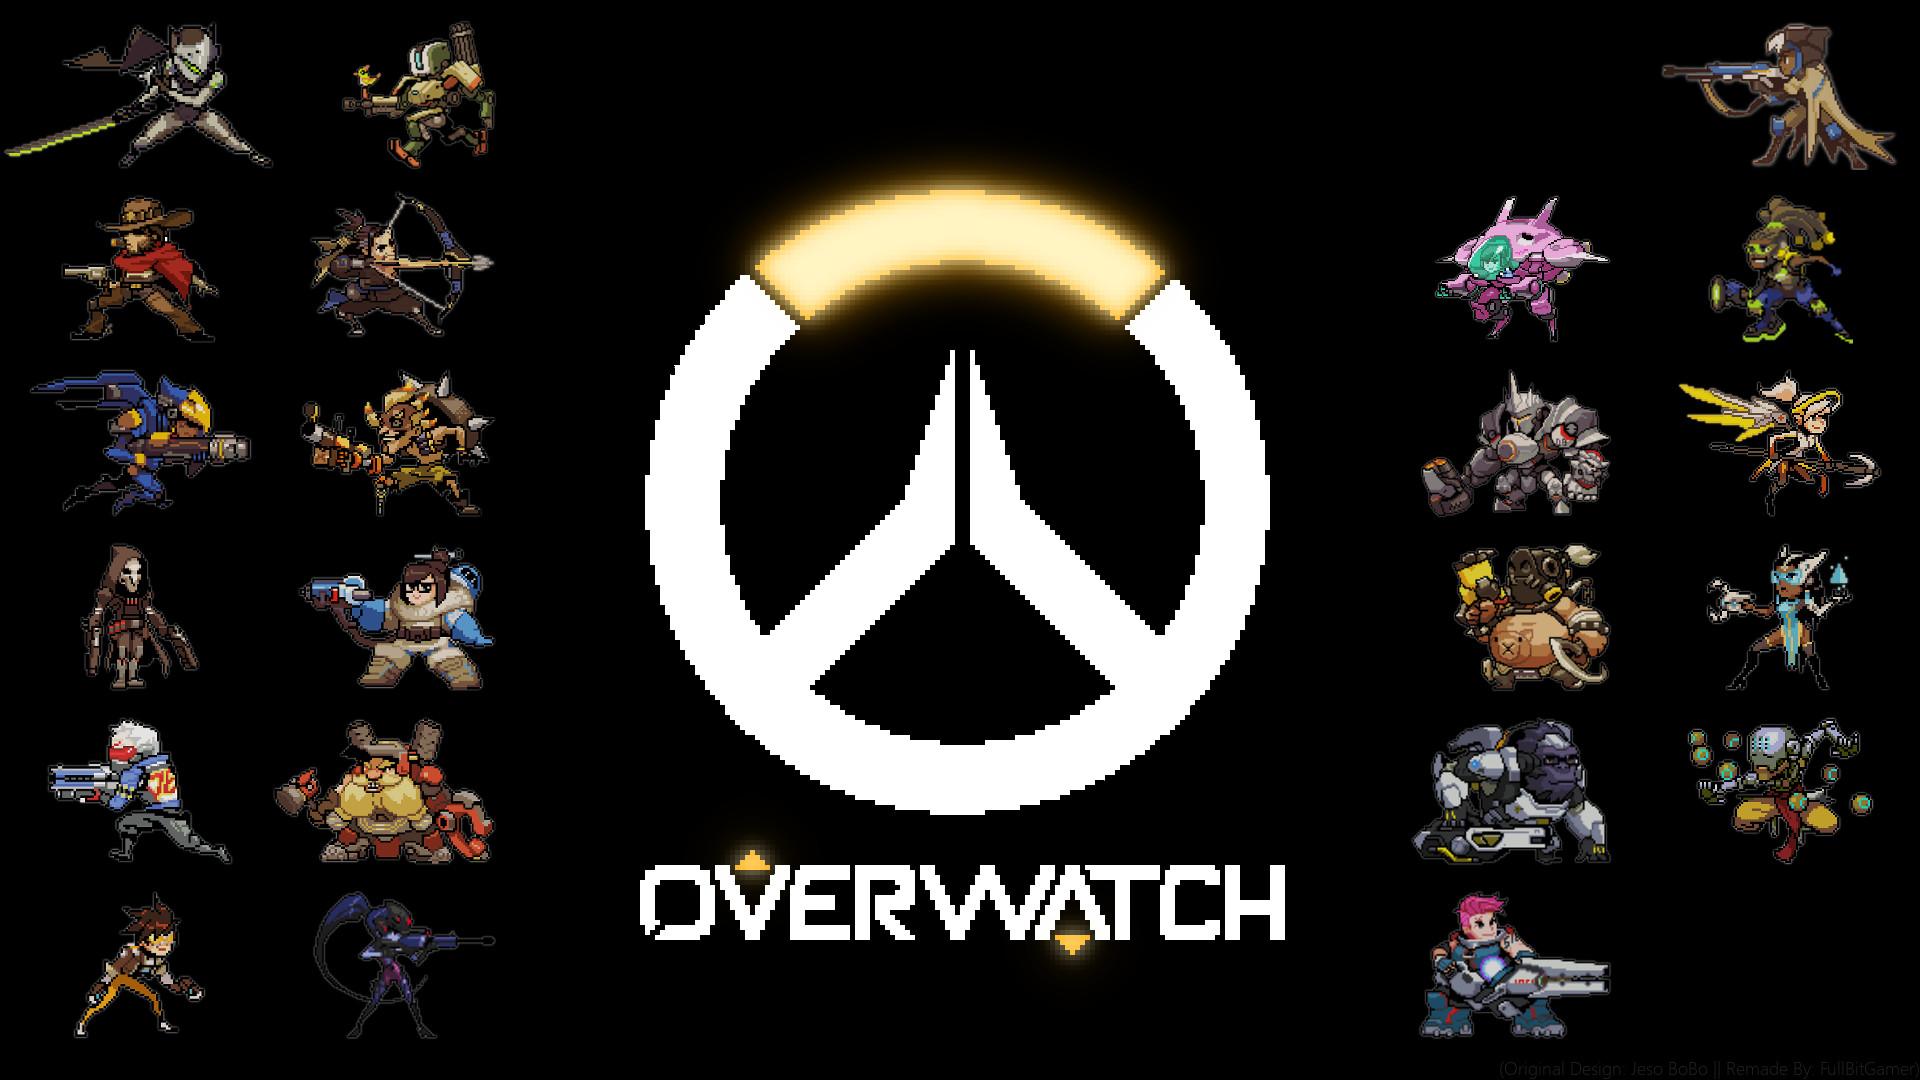 Overwatch Cute Sprays Wallpaper Gremlin Wallpaper 69 Images